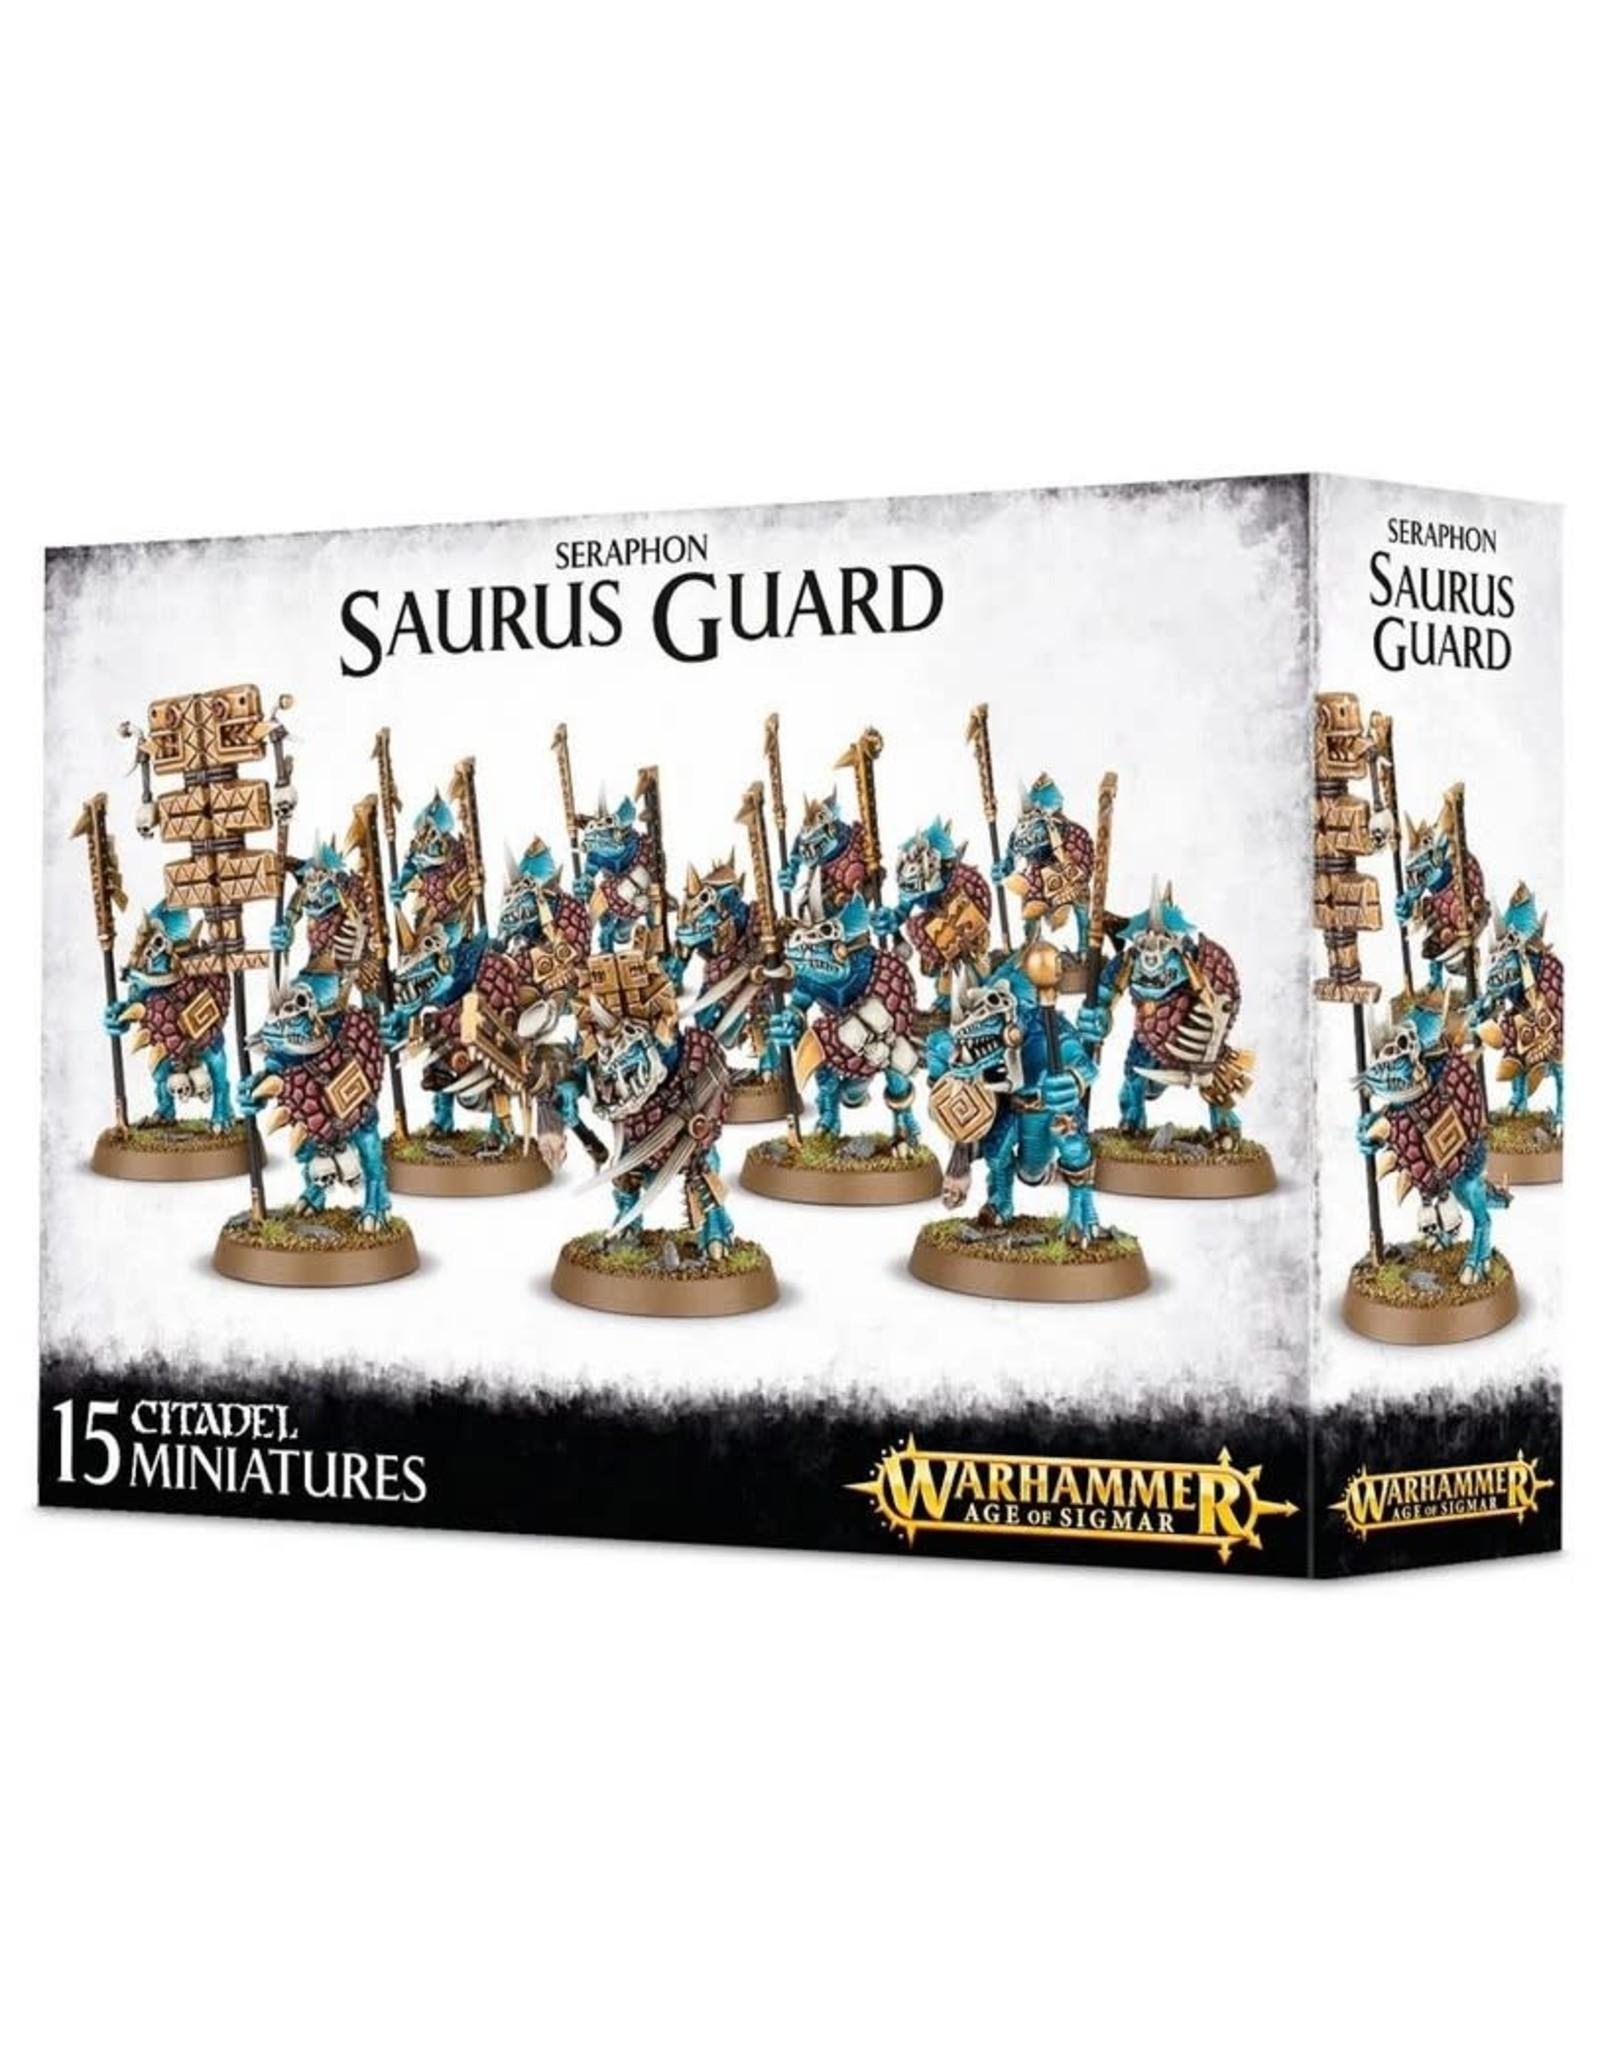 Warhammer AoS WHAoS Seraphon Saurus Guard